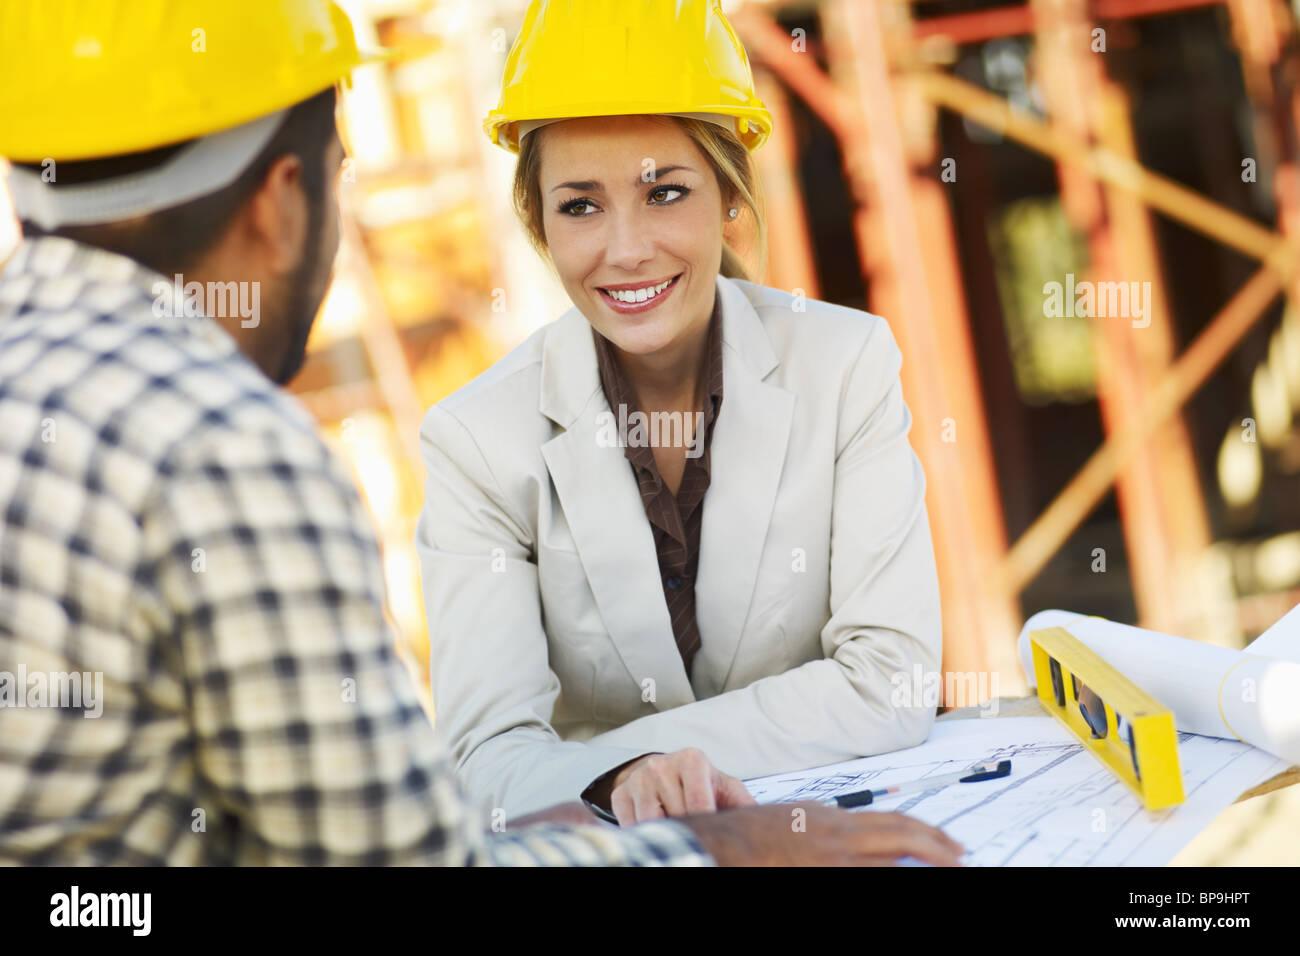 latin construction worker and female architect - Stock Image